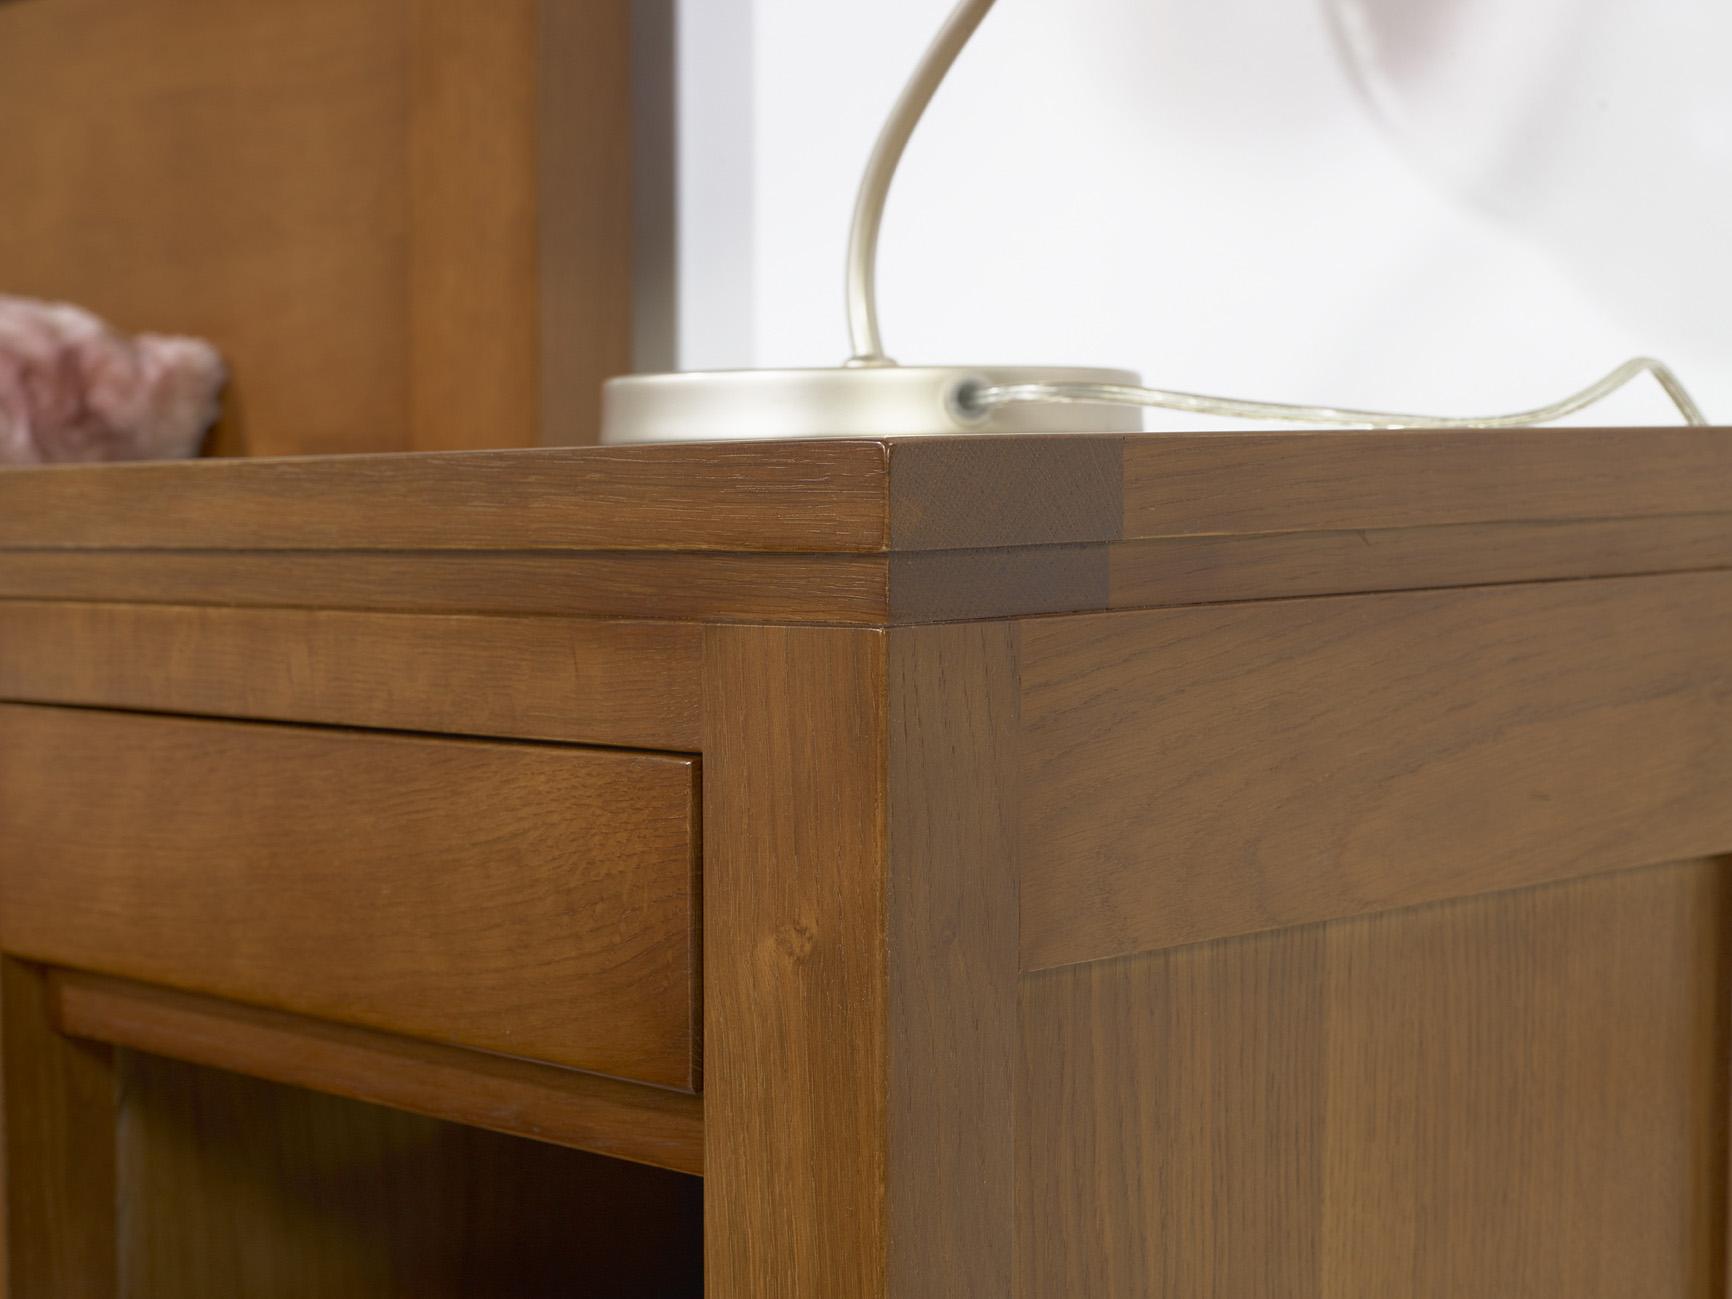 Commode 3 tiroirs en ch ne massif de style contemporain meuble en ch ne massif - Meubles contemporains bois massif ...